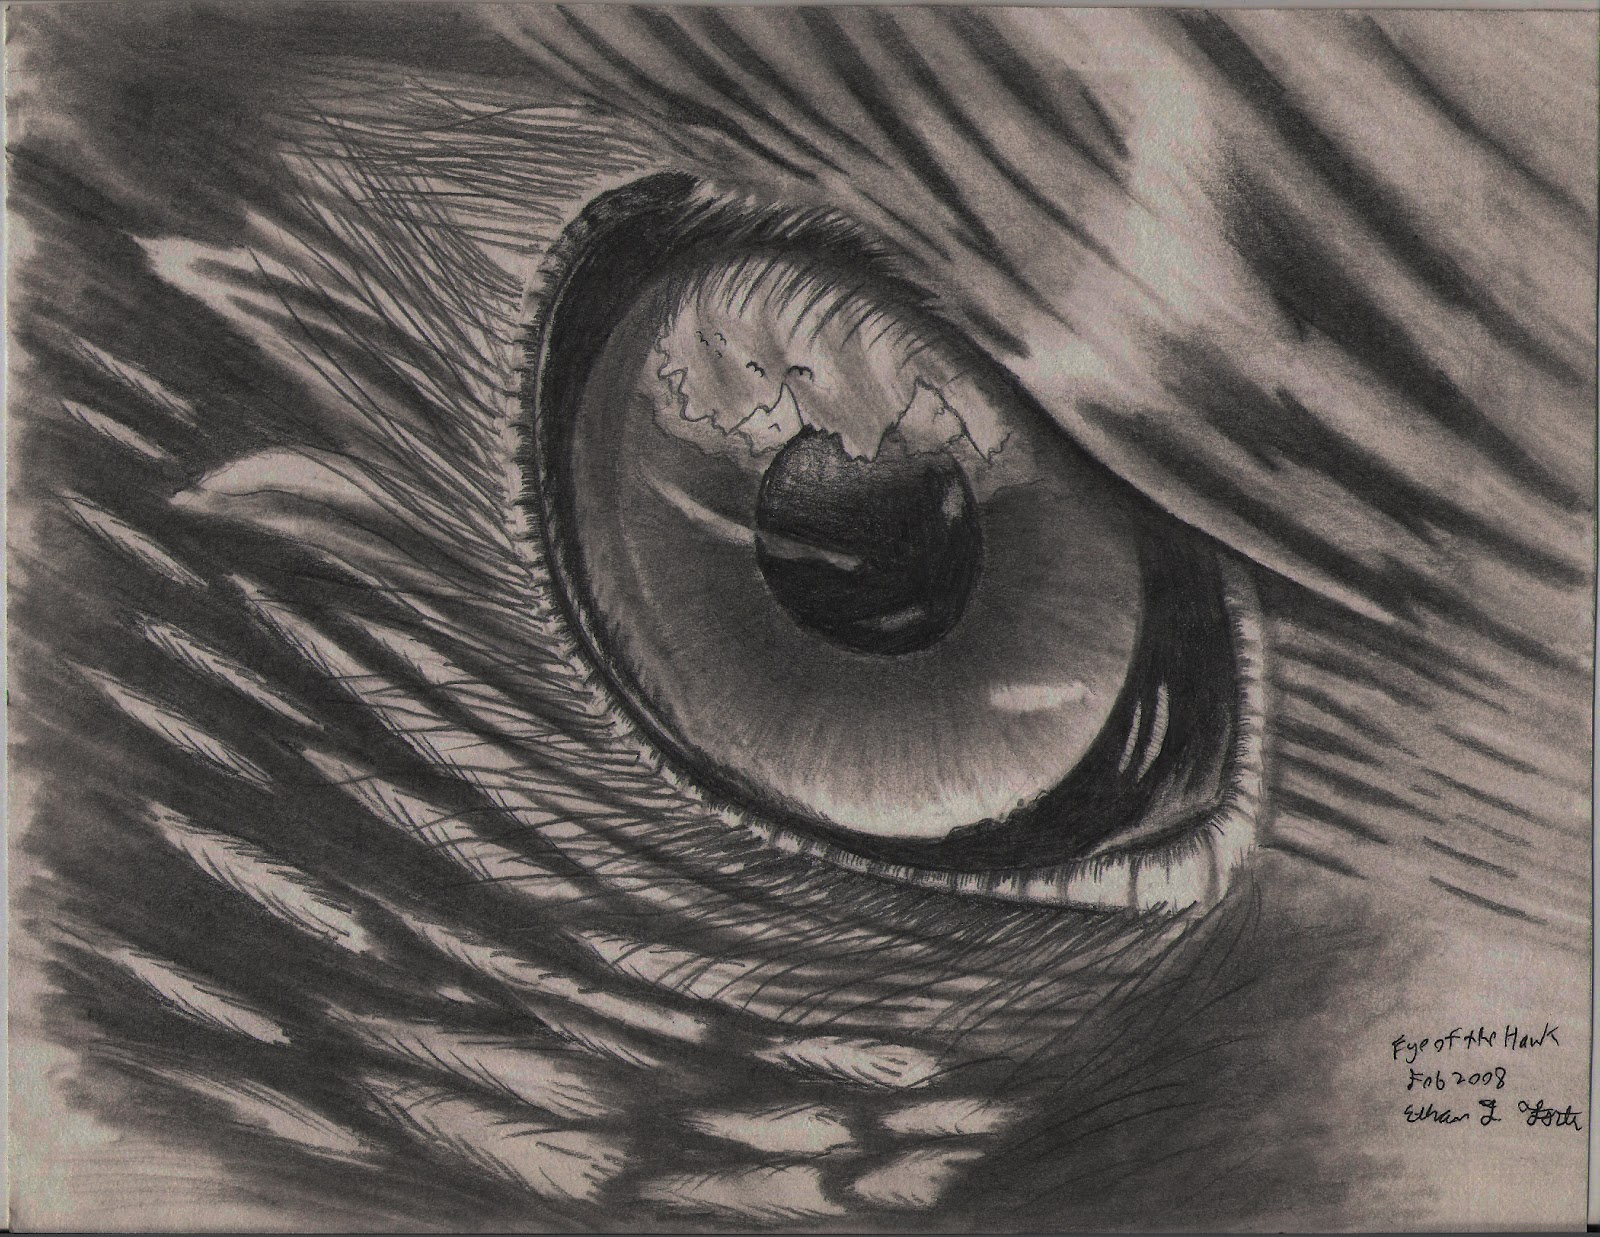 Hawk eye pencil drawing in h hb b3 and mech pencil